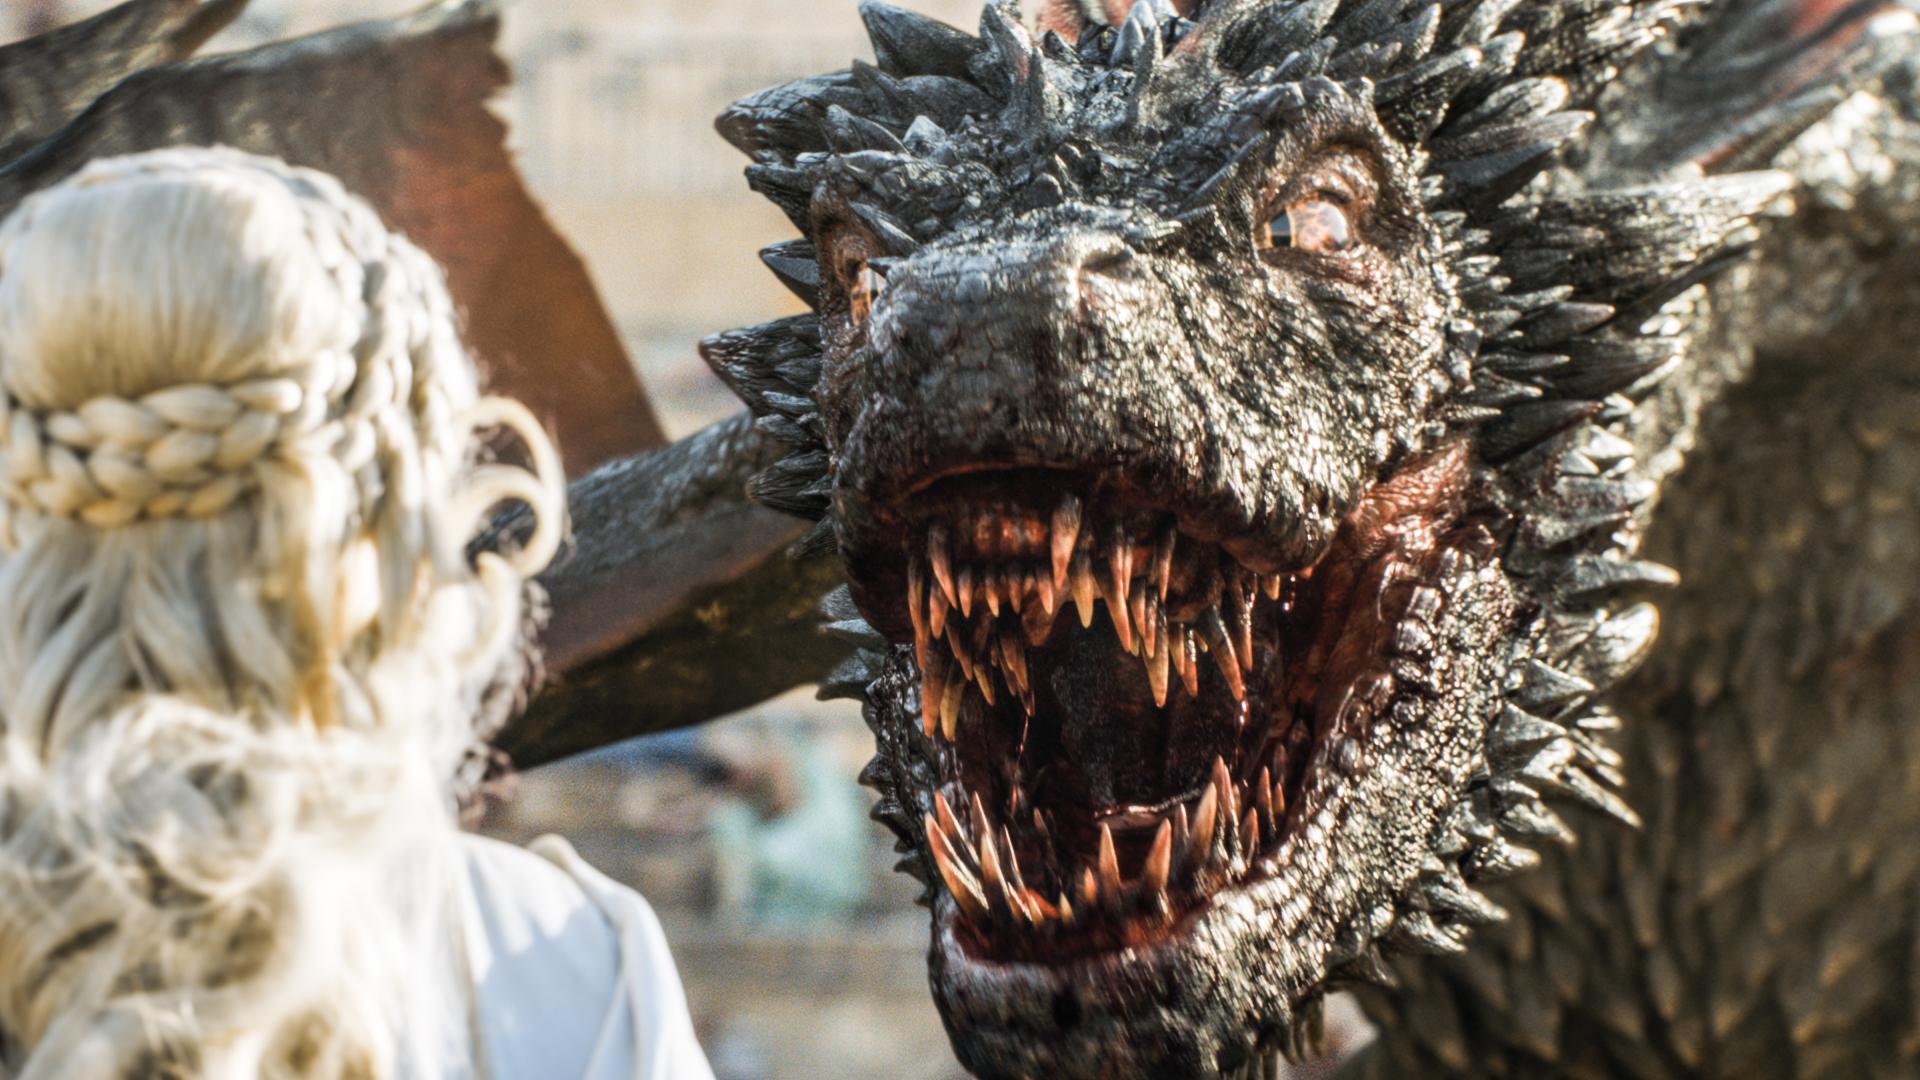 Game of Thrones. Brush your teeth, Drogon!